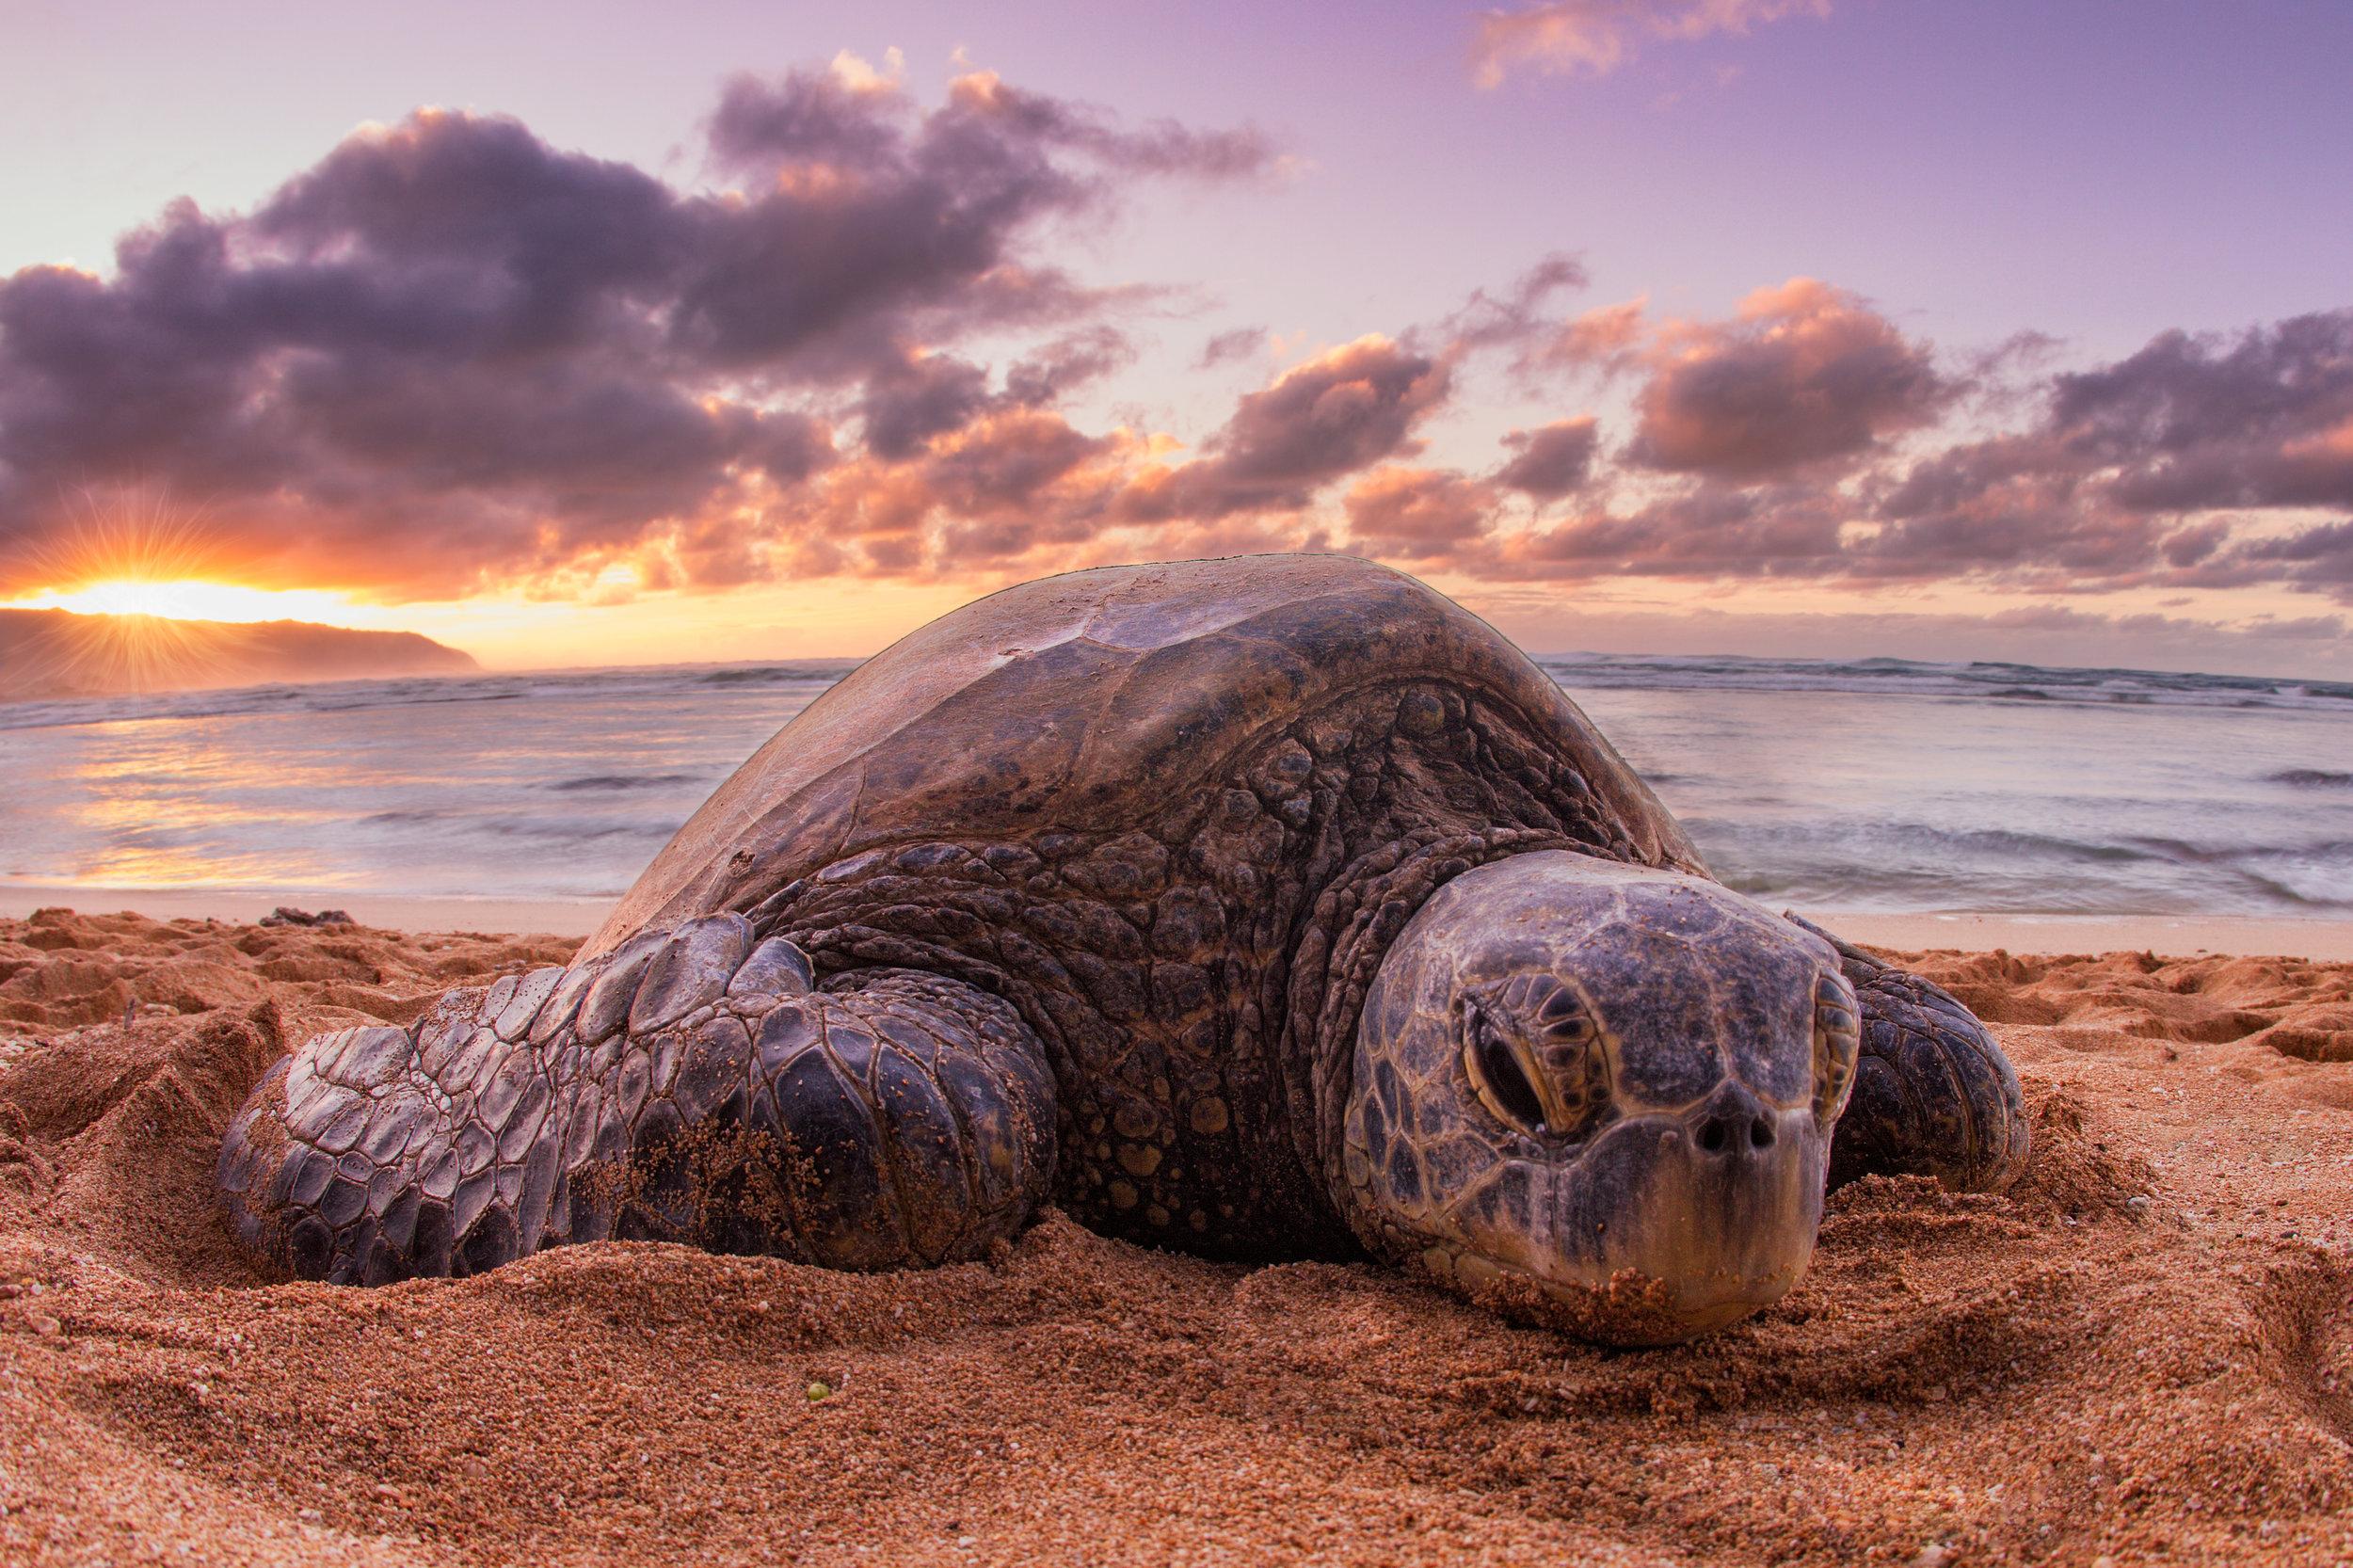 Sea-Turtle-Beached-Sunset-SM.jpg